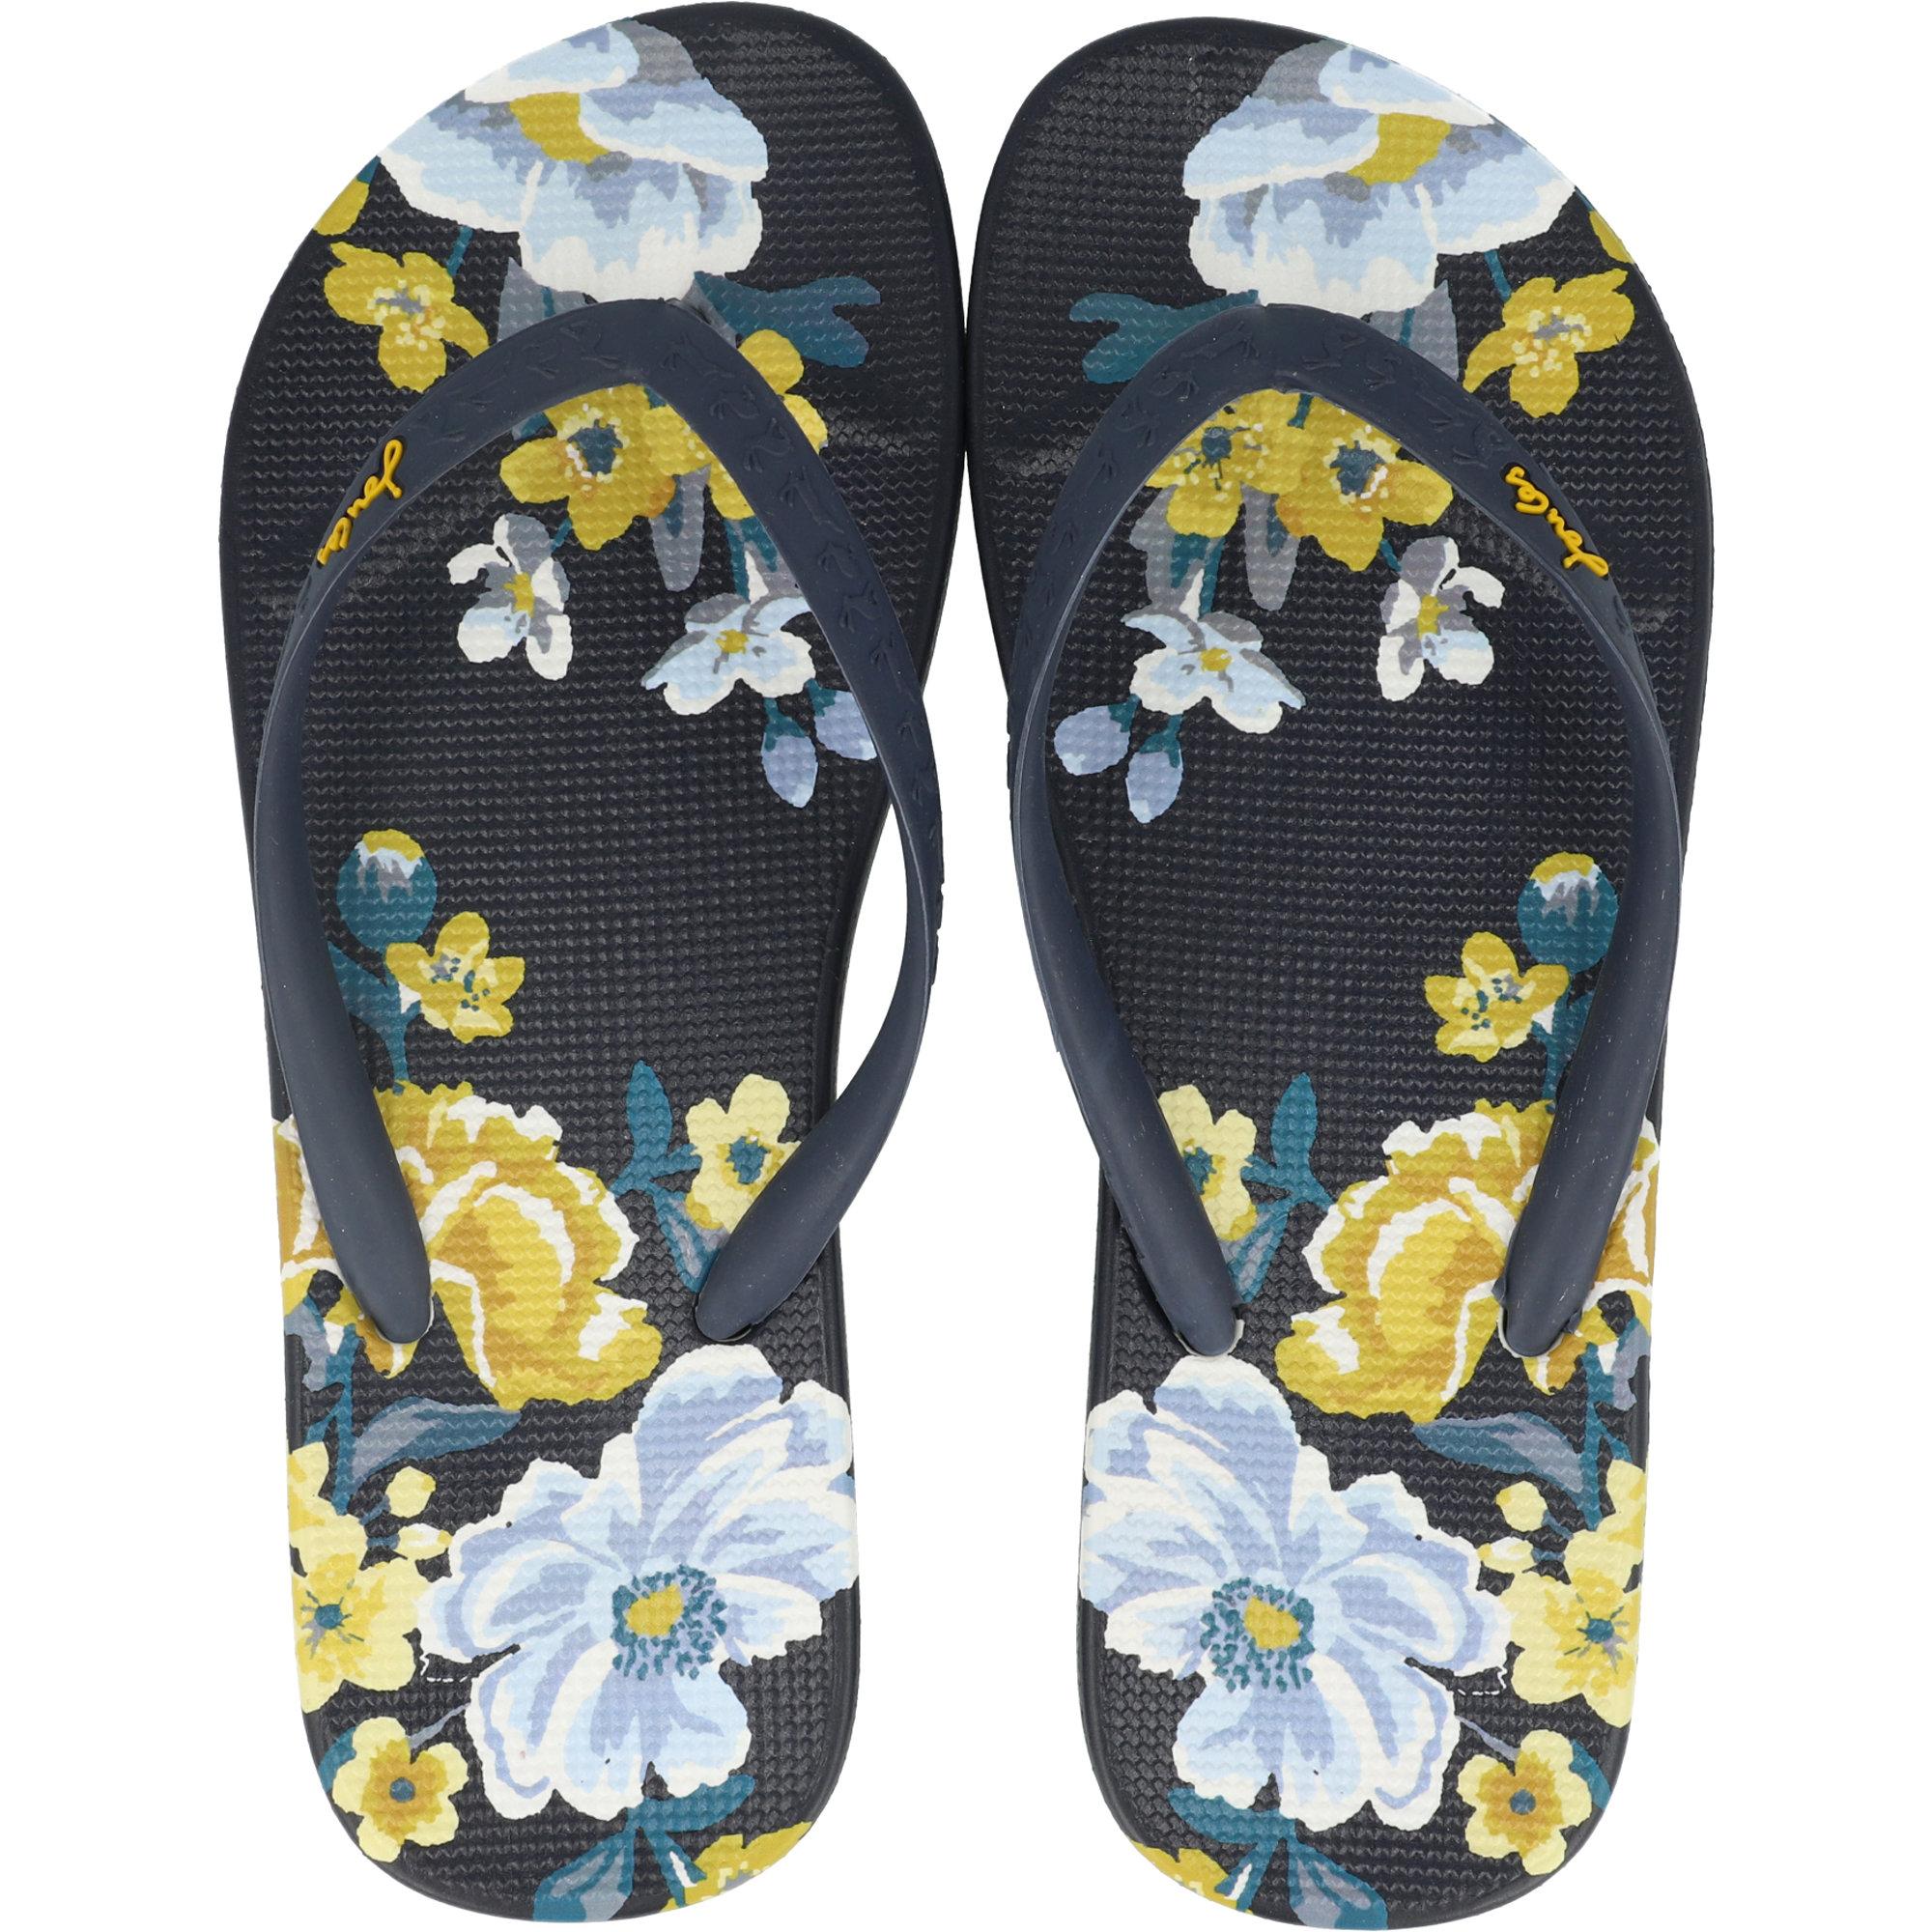 Joules Womens Flip Flops in NAVY BOTANICAL